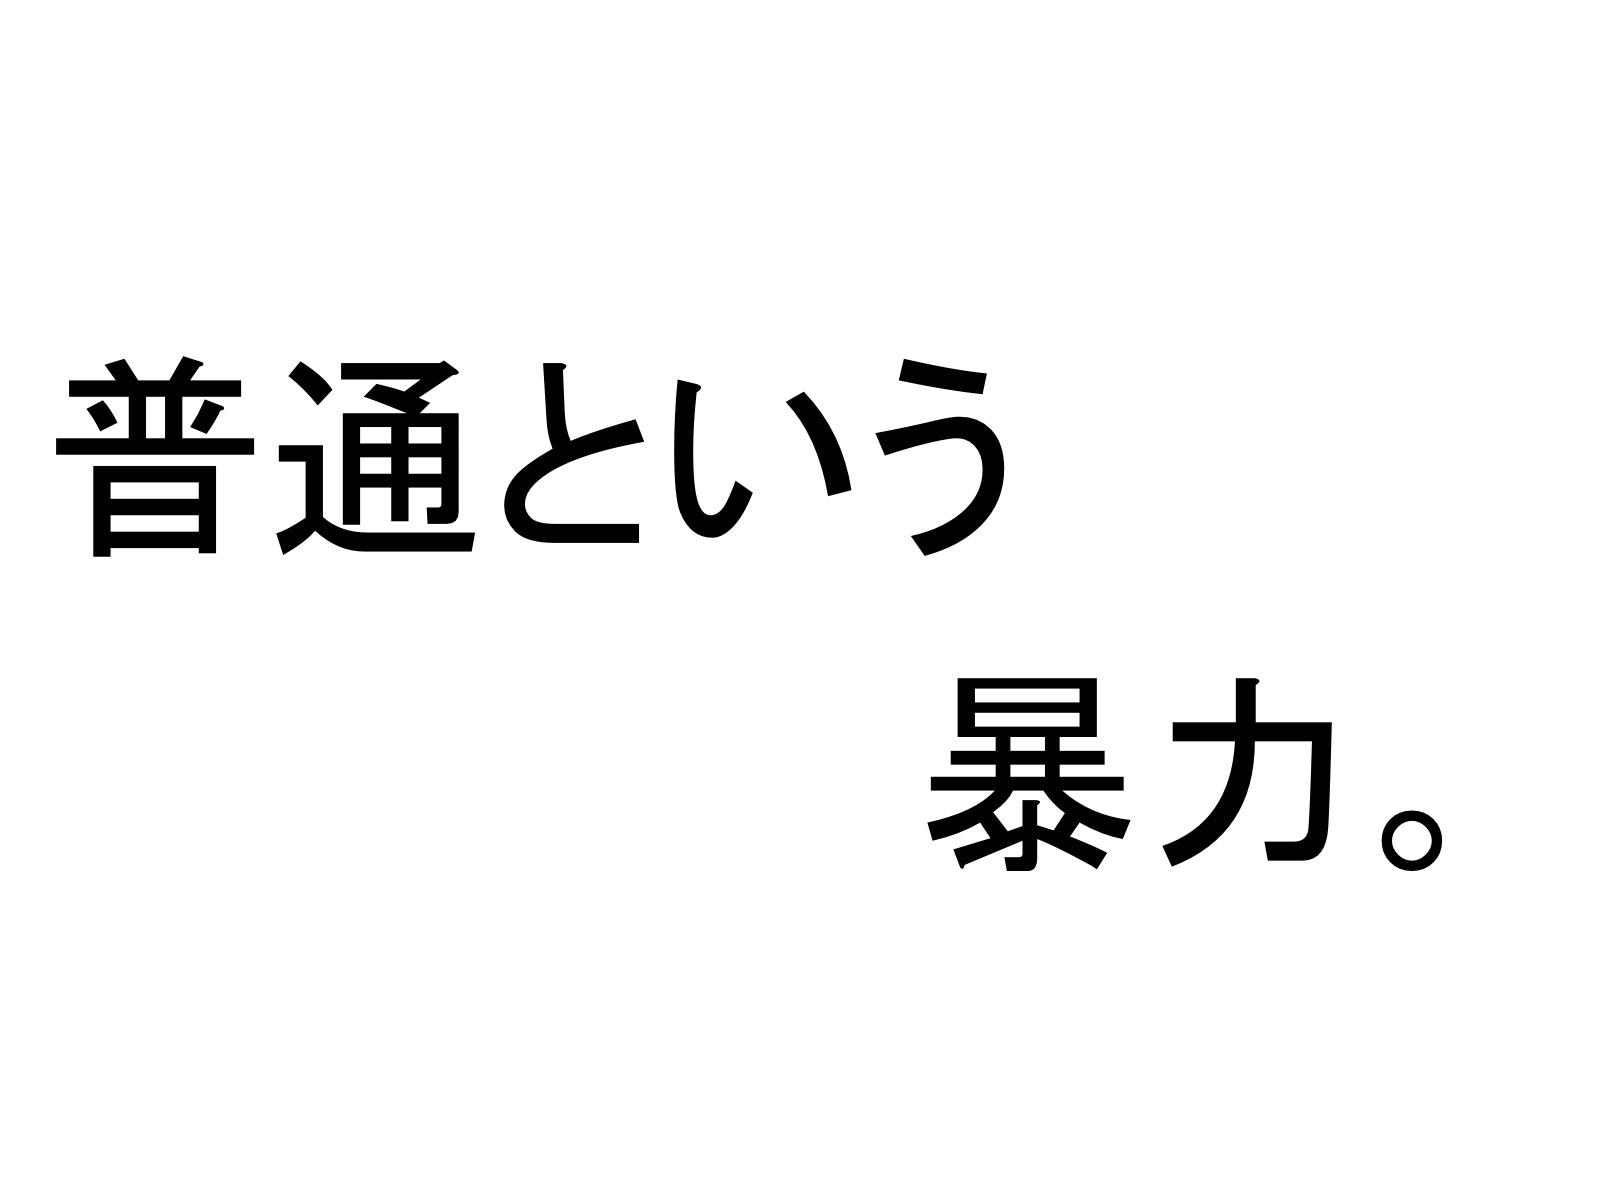 2016 07 15 22 16 23